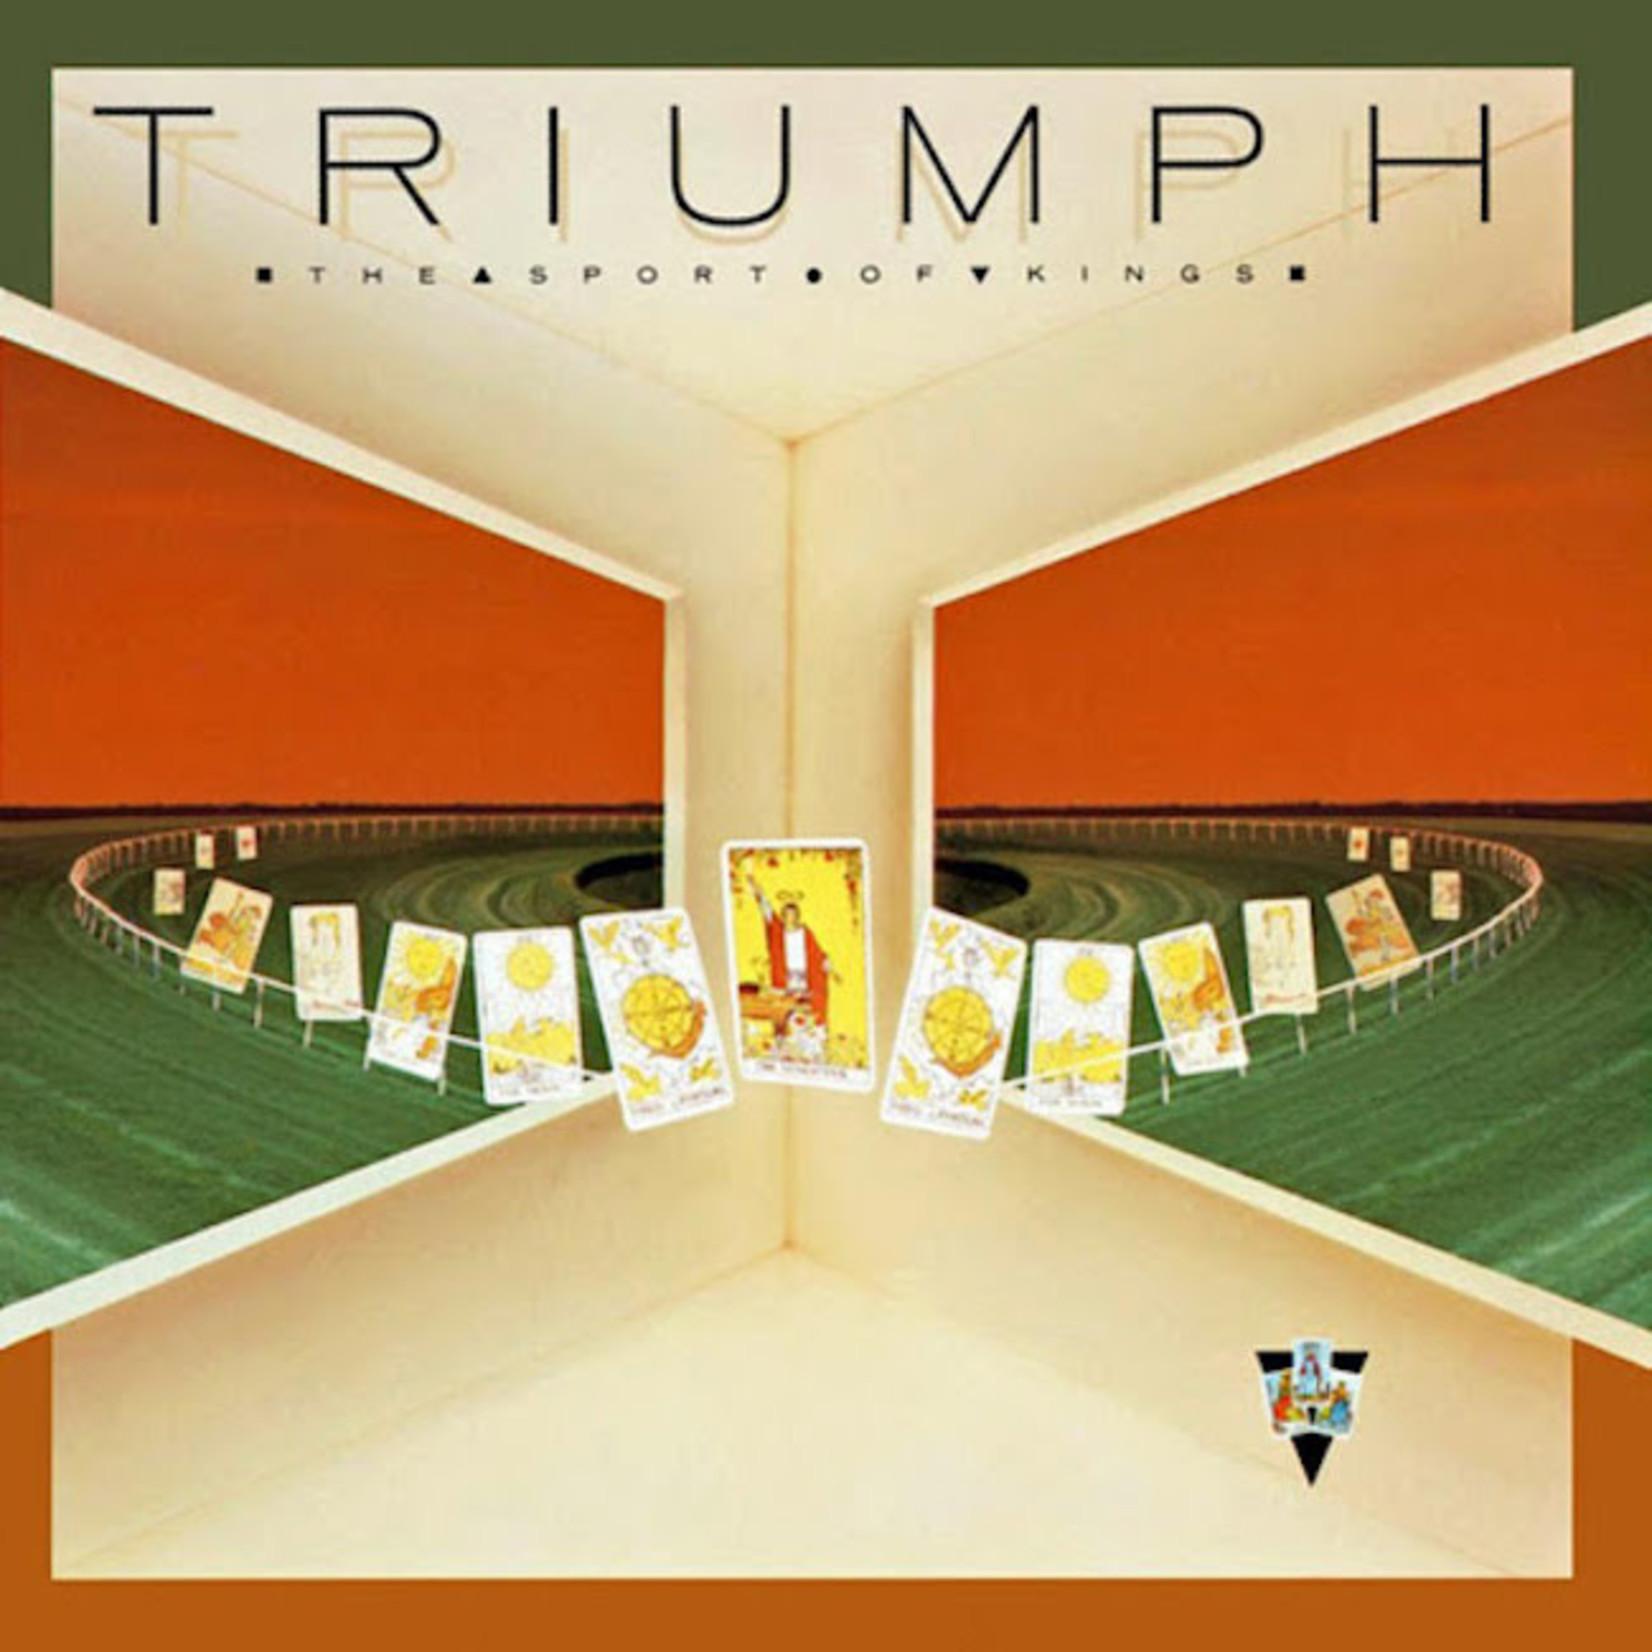 [Vintage] Triumph: Sport of Kings